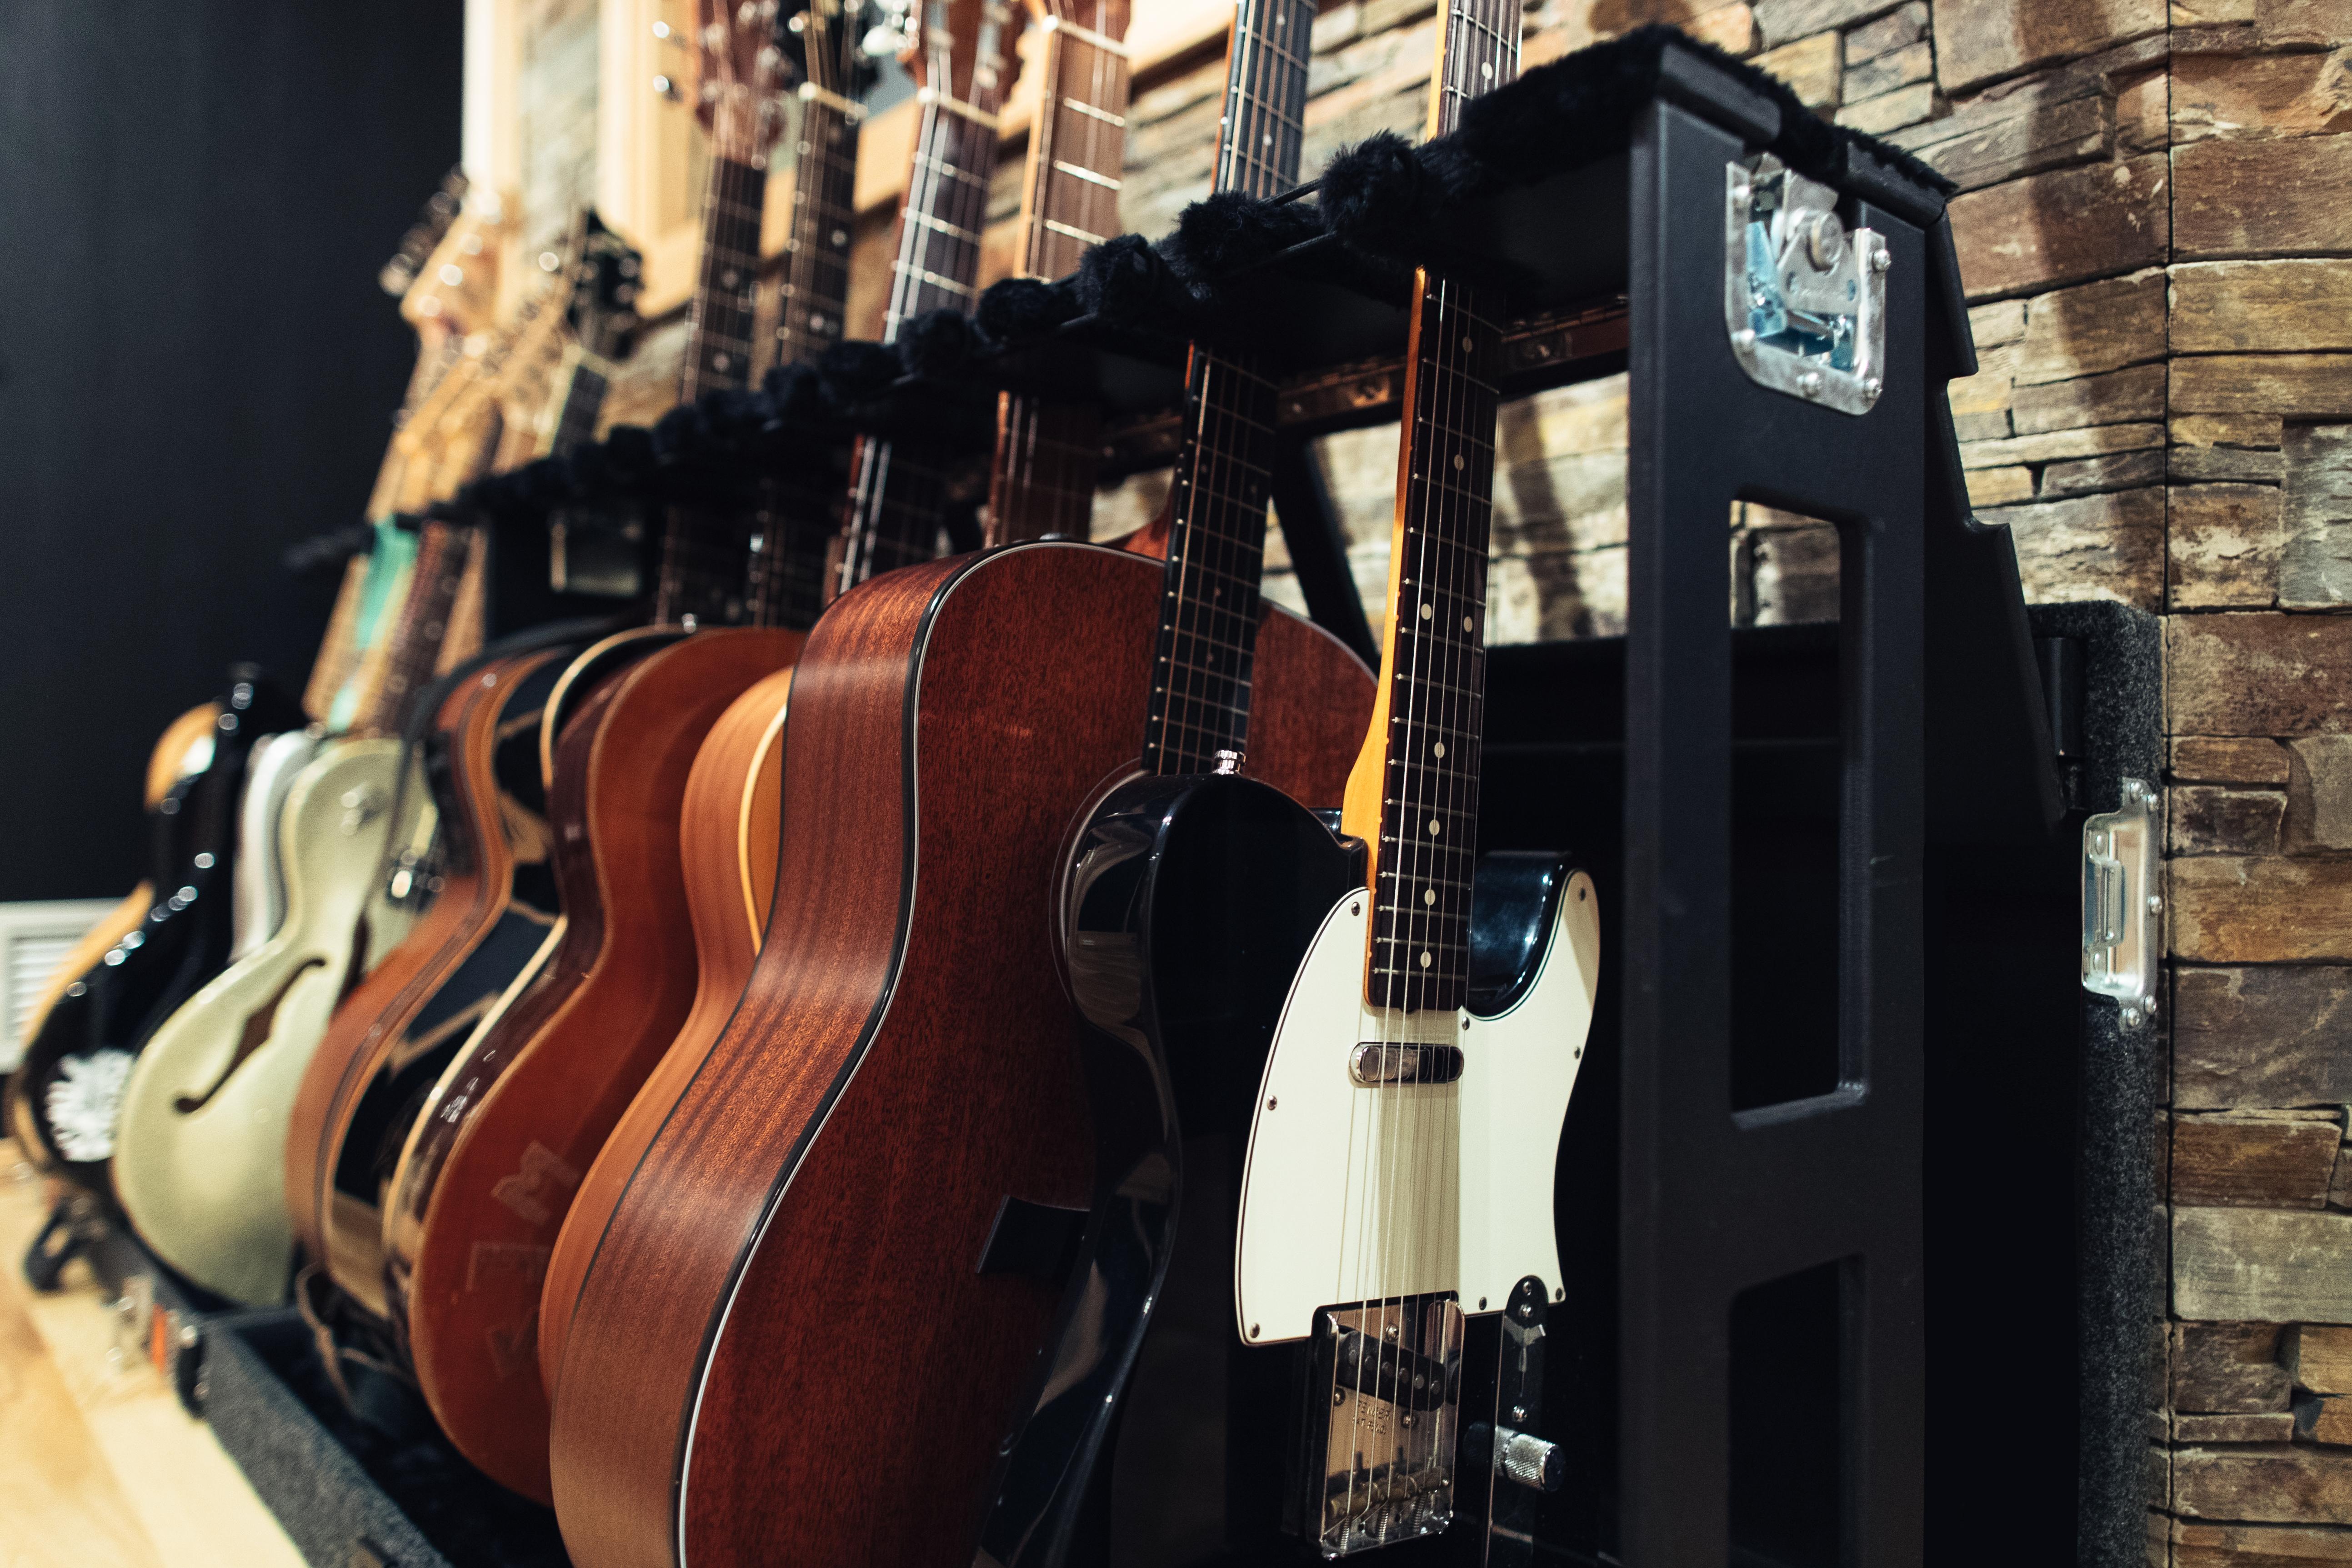 Guitar boats